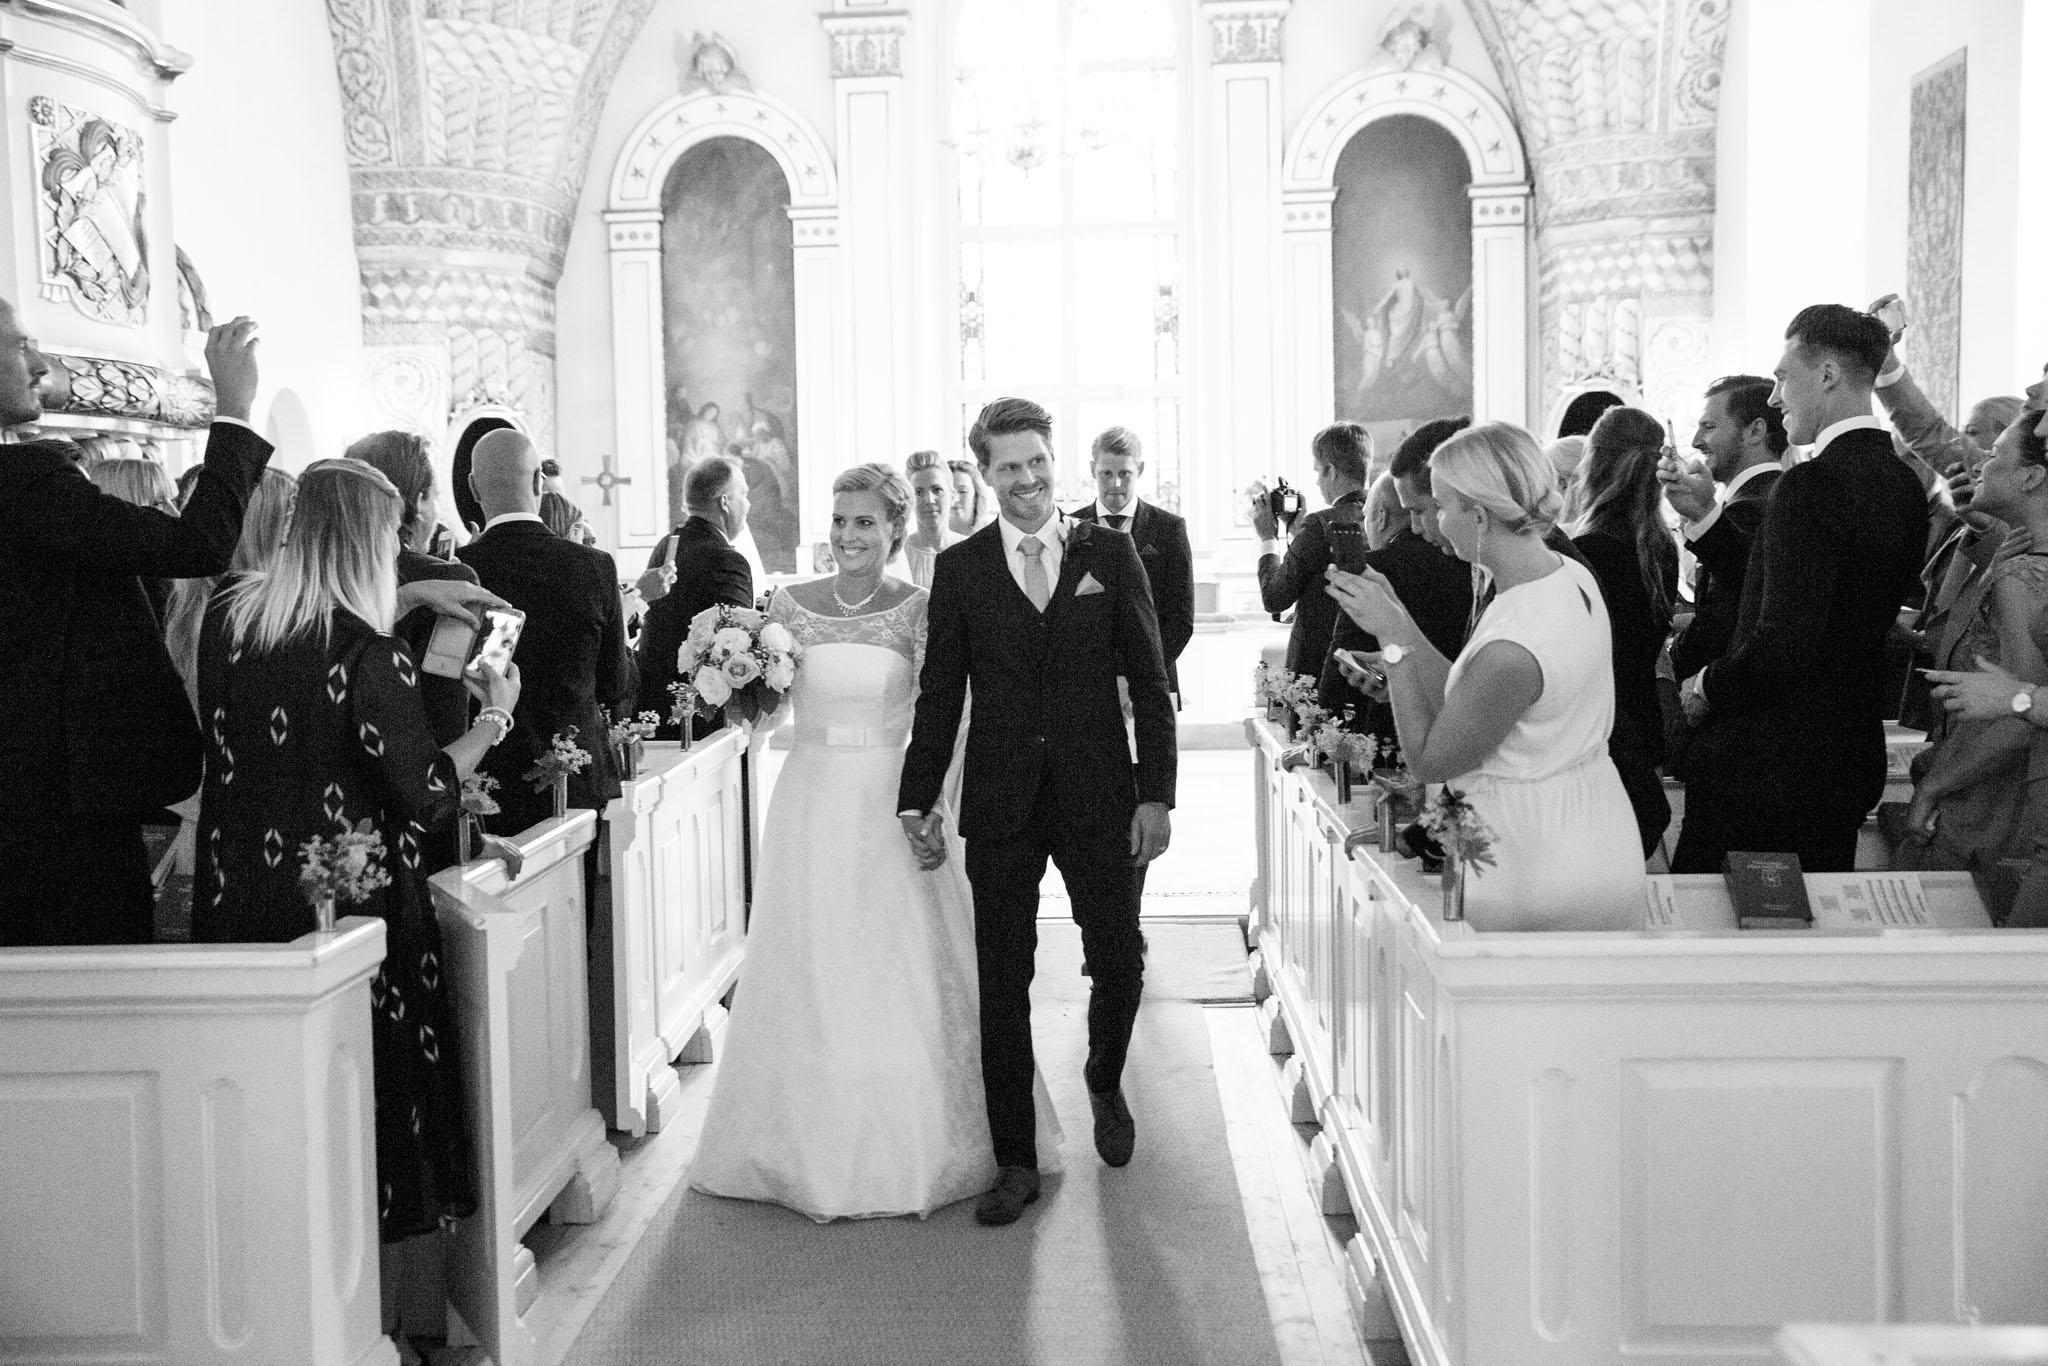 fotograf sabina wixner hudiksvall bröllop 9.jpg